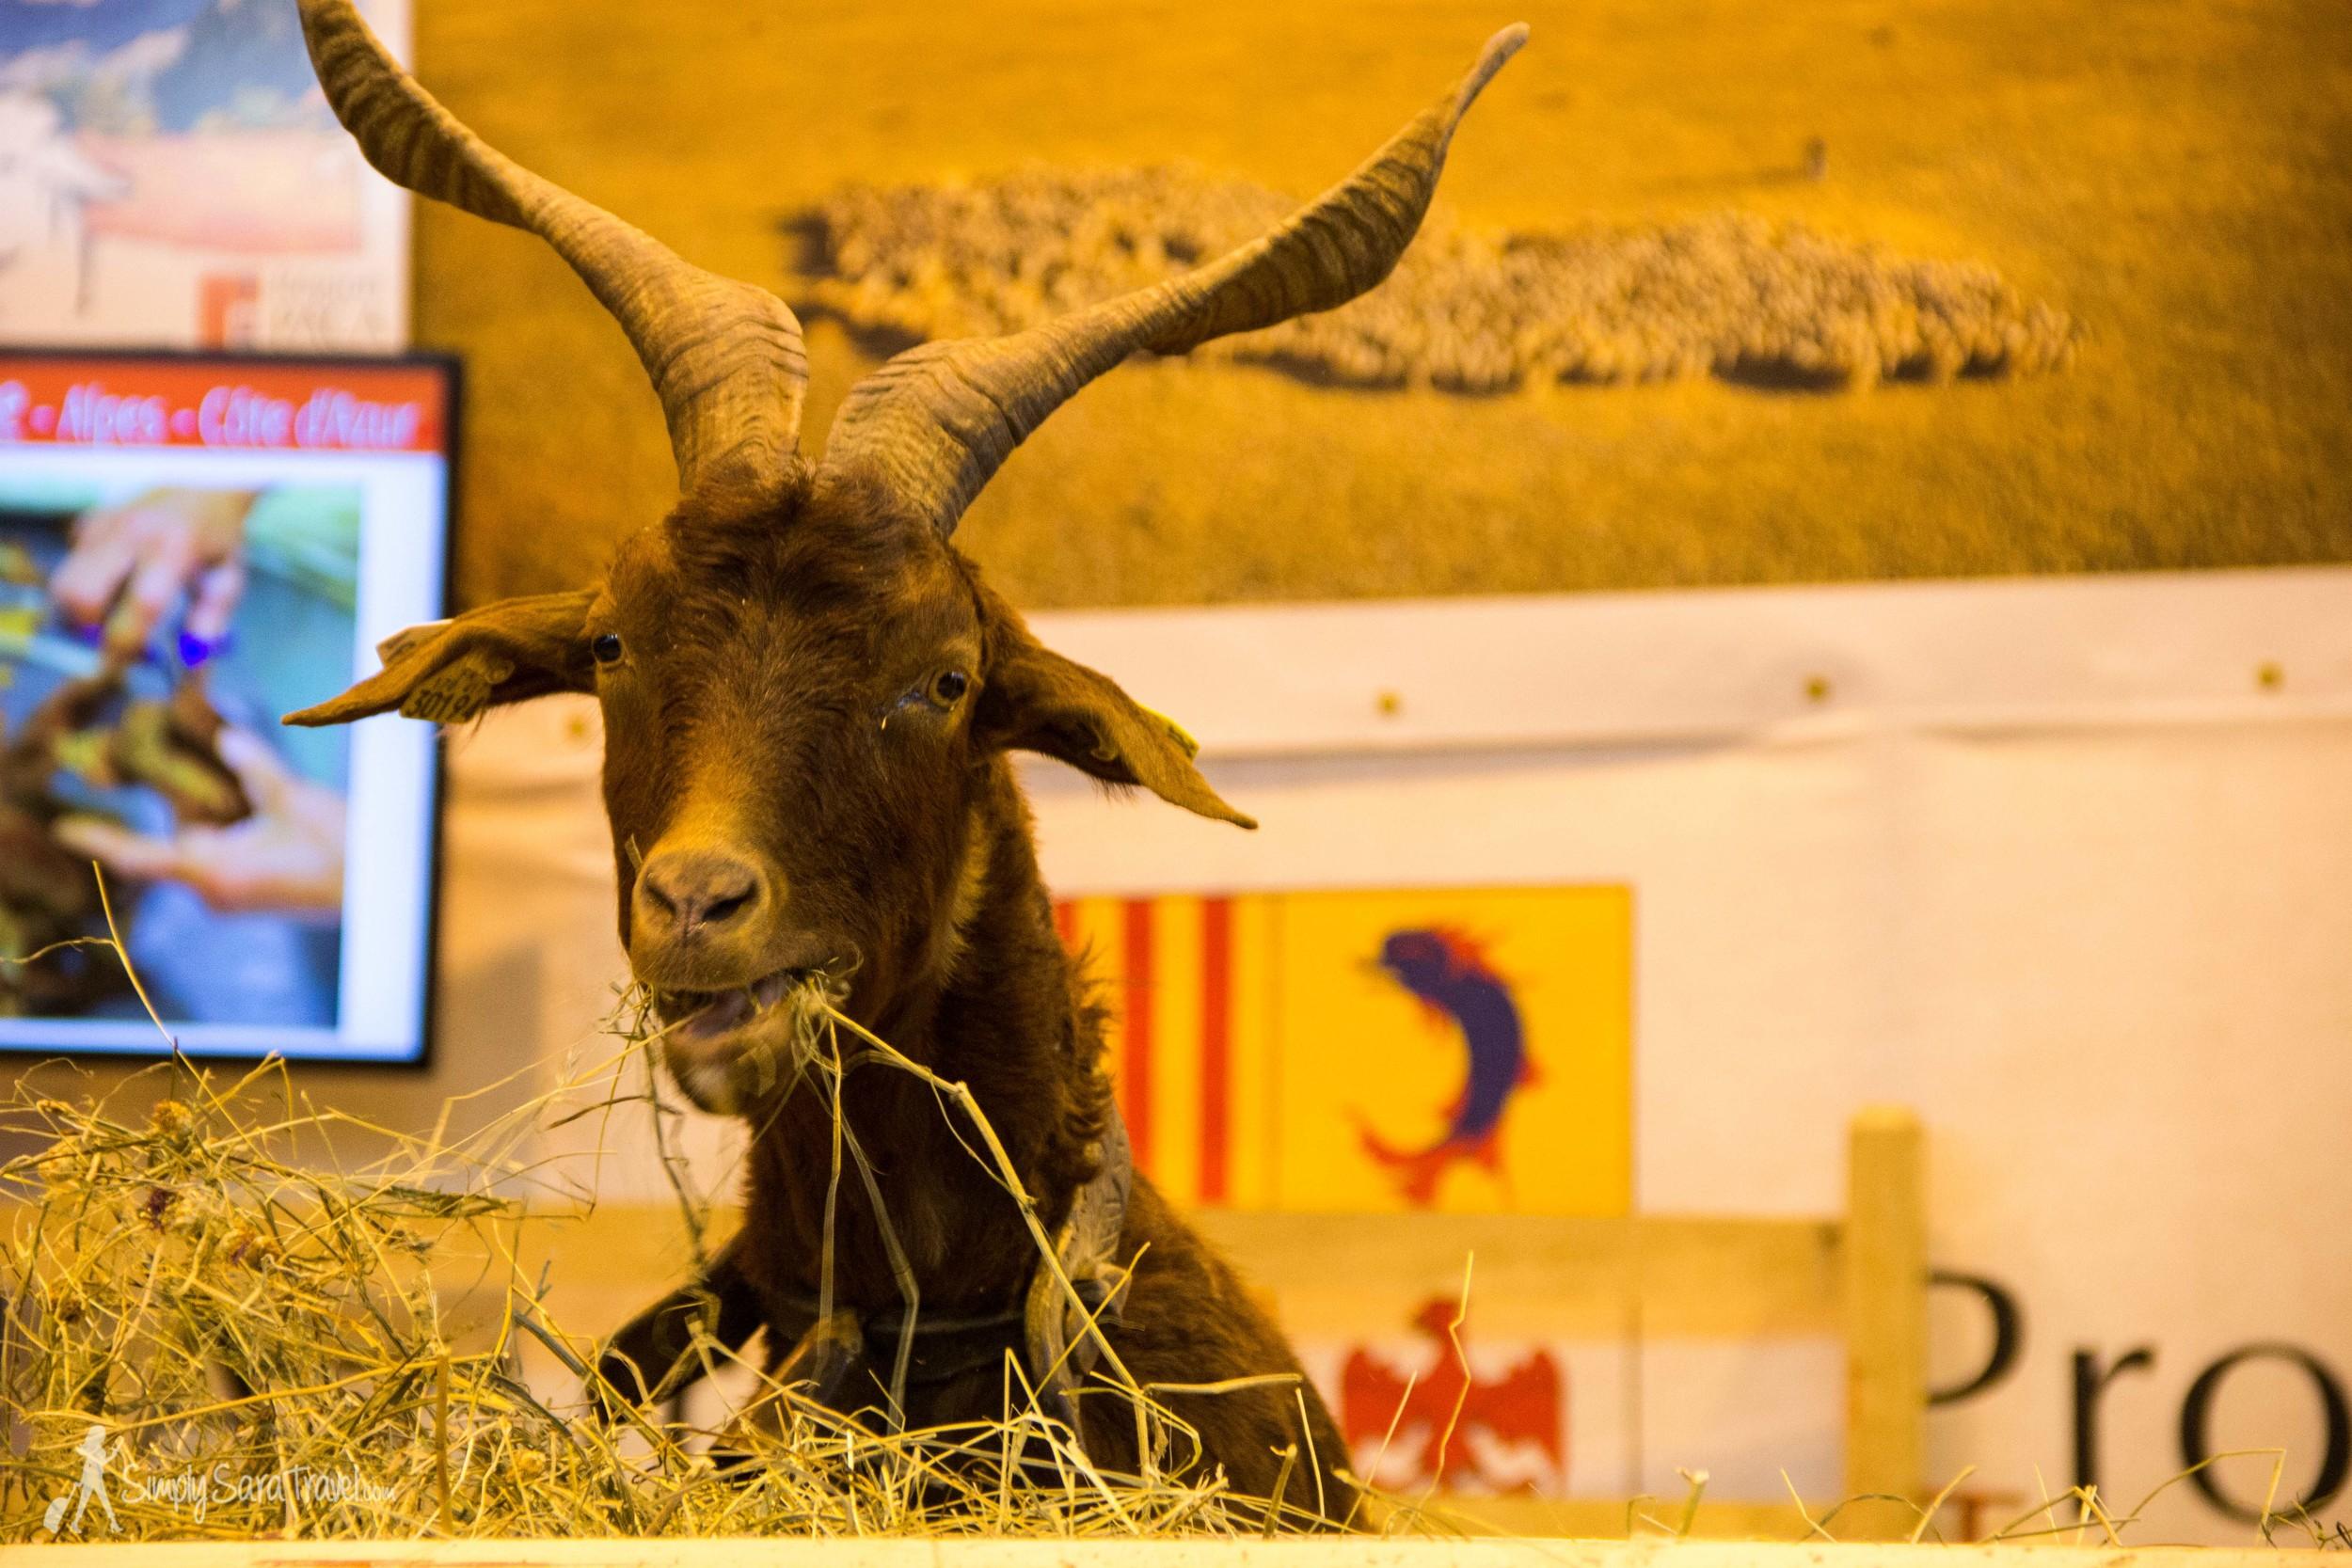 Goat eating hay,Salon International de l'Agriculture (International Agricultural Show) Paris France